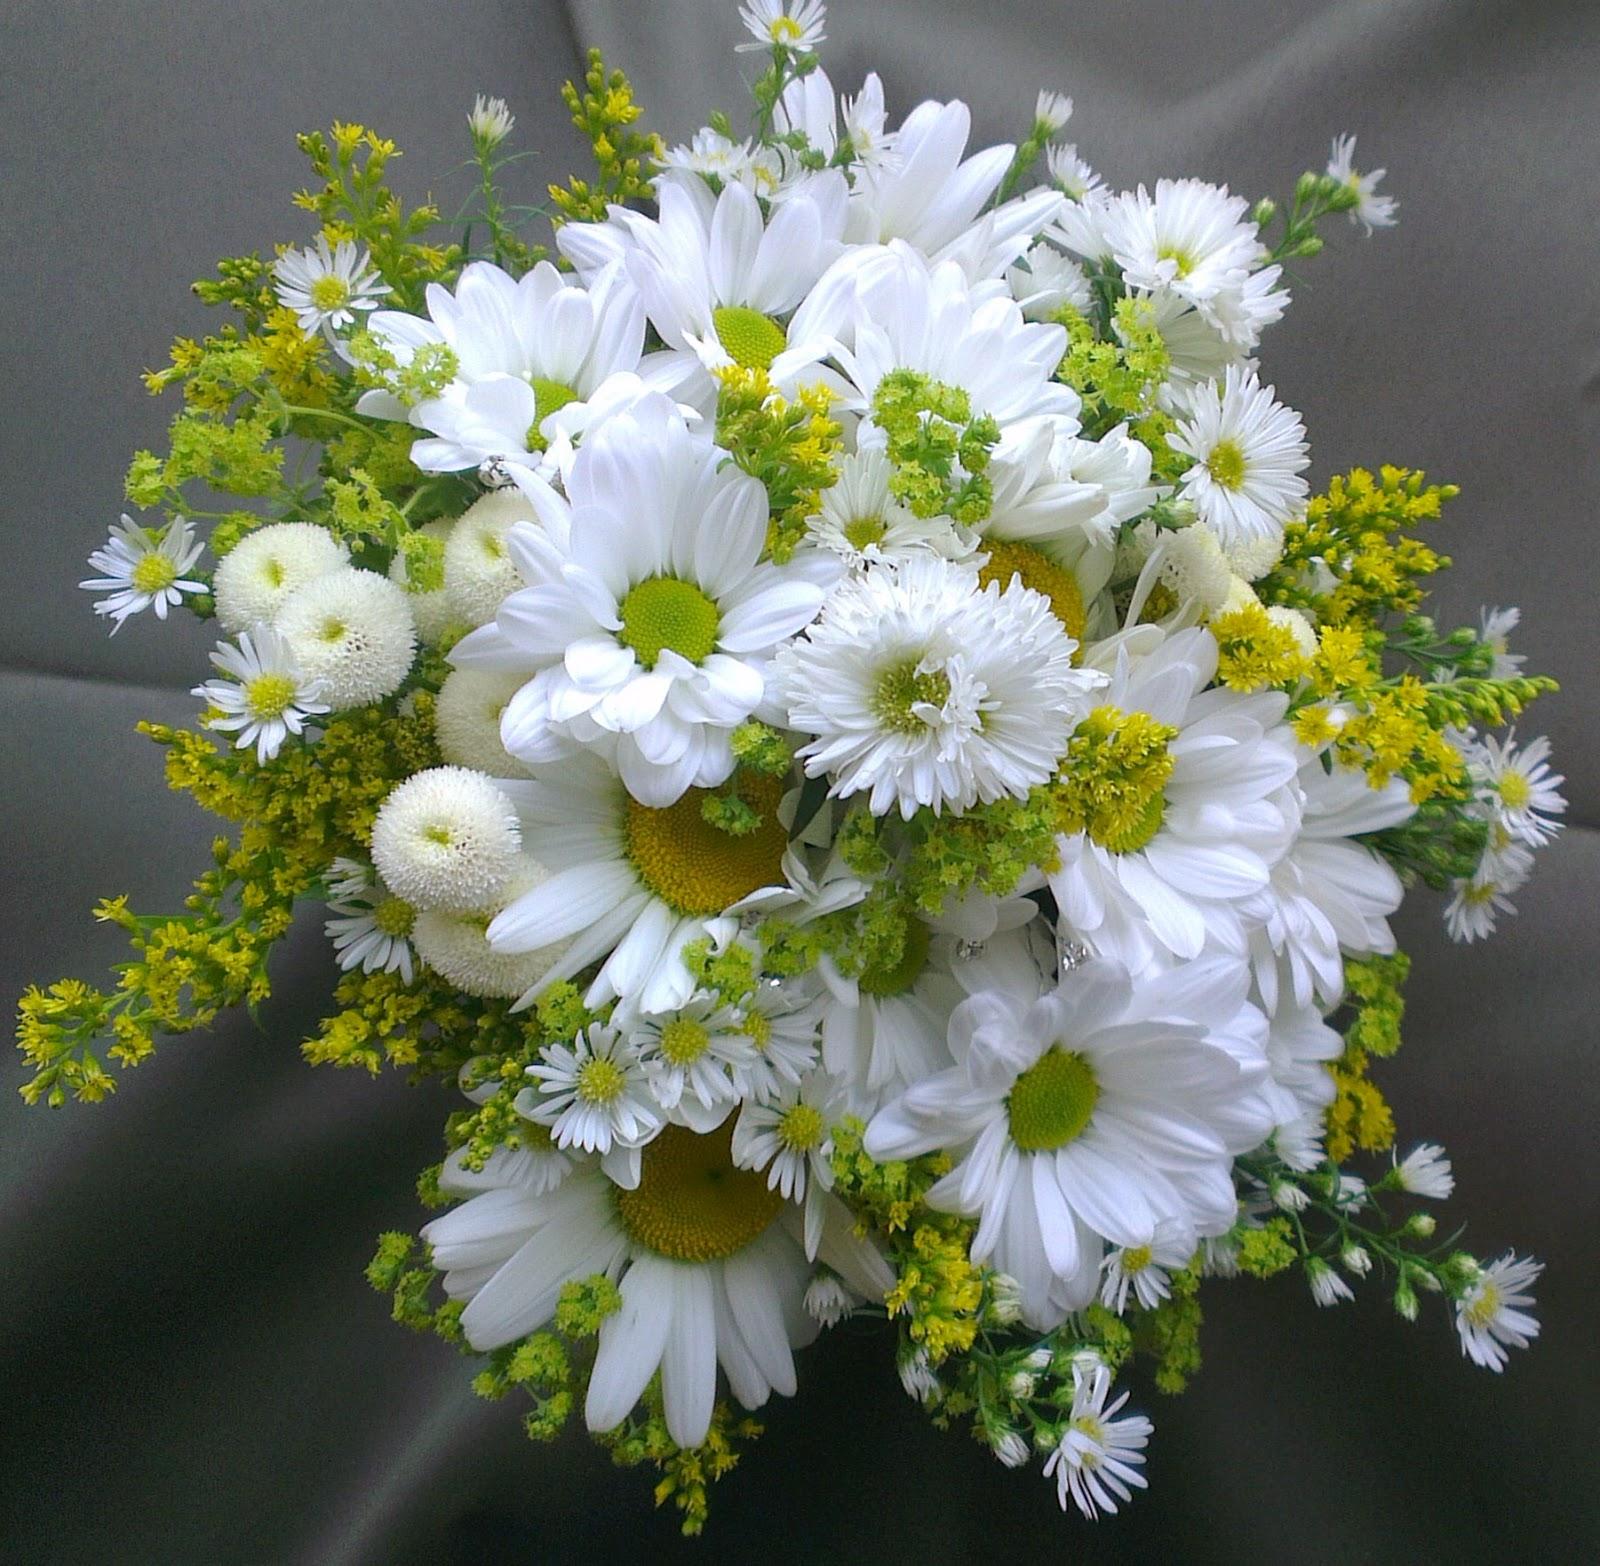 Sandra's Flower Studio: Daisy Bouquets And Buttonholes